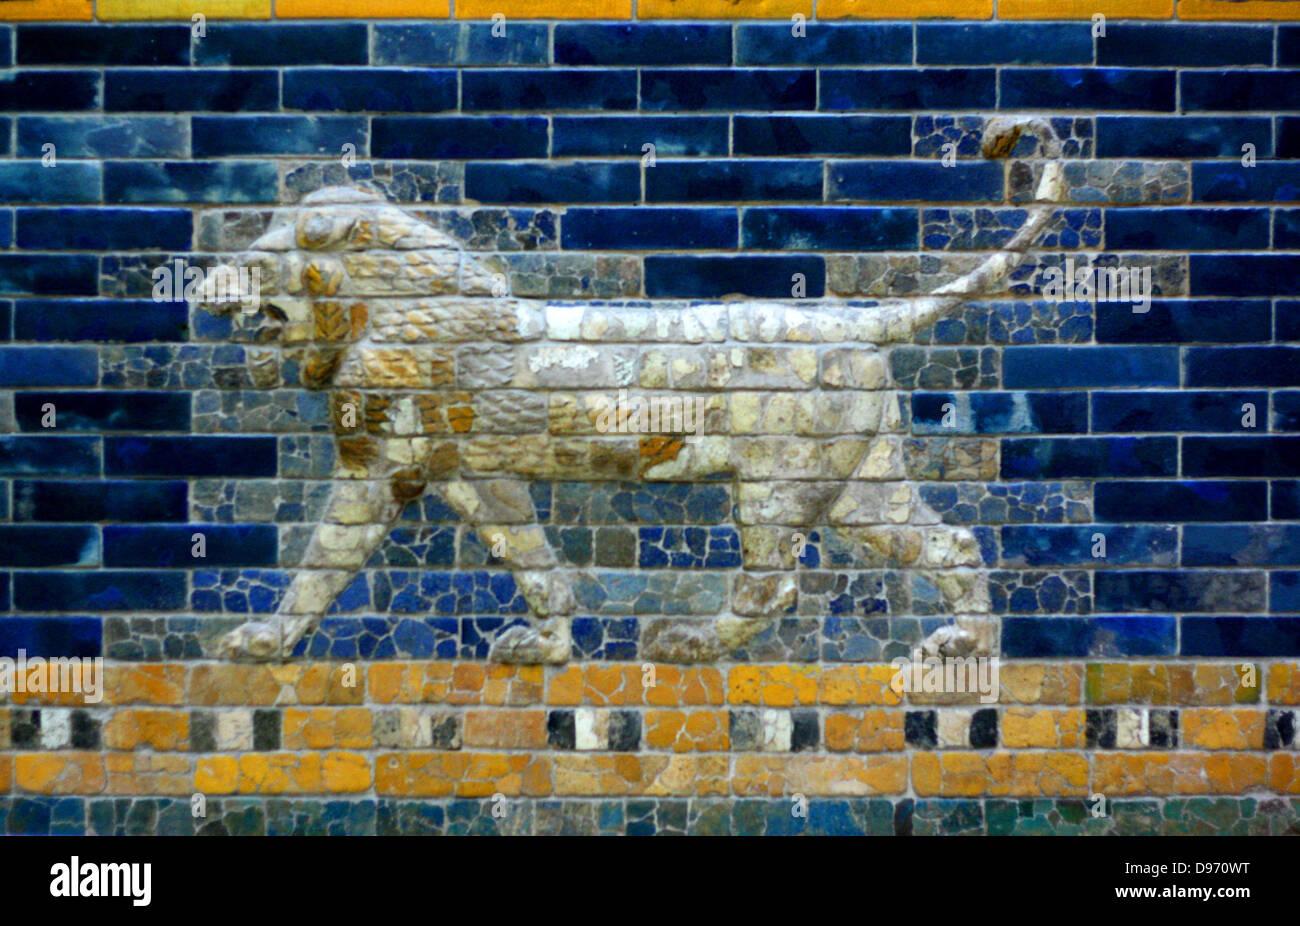 Ishtar Gates, Babylon plus details showing palms, lions and animals. Stock Photo